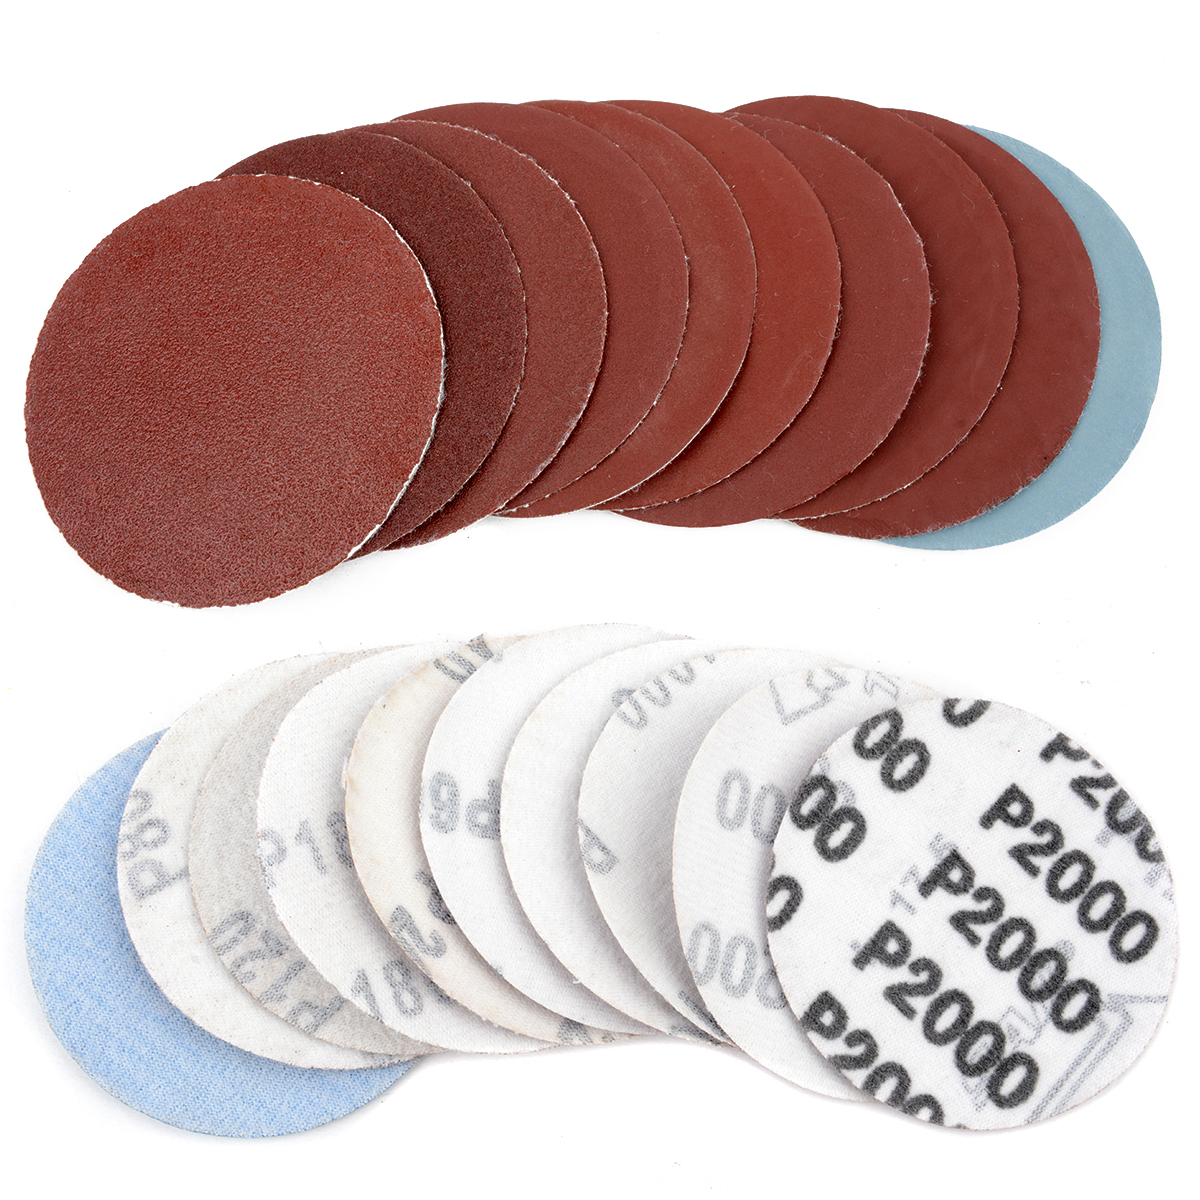 100Pcs 75mm Round Sandpaper 3